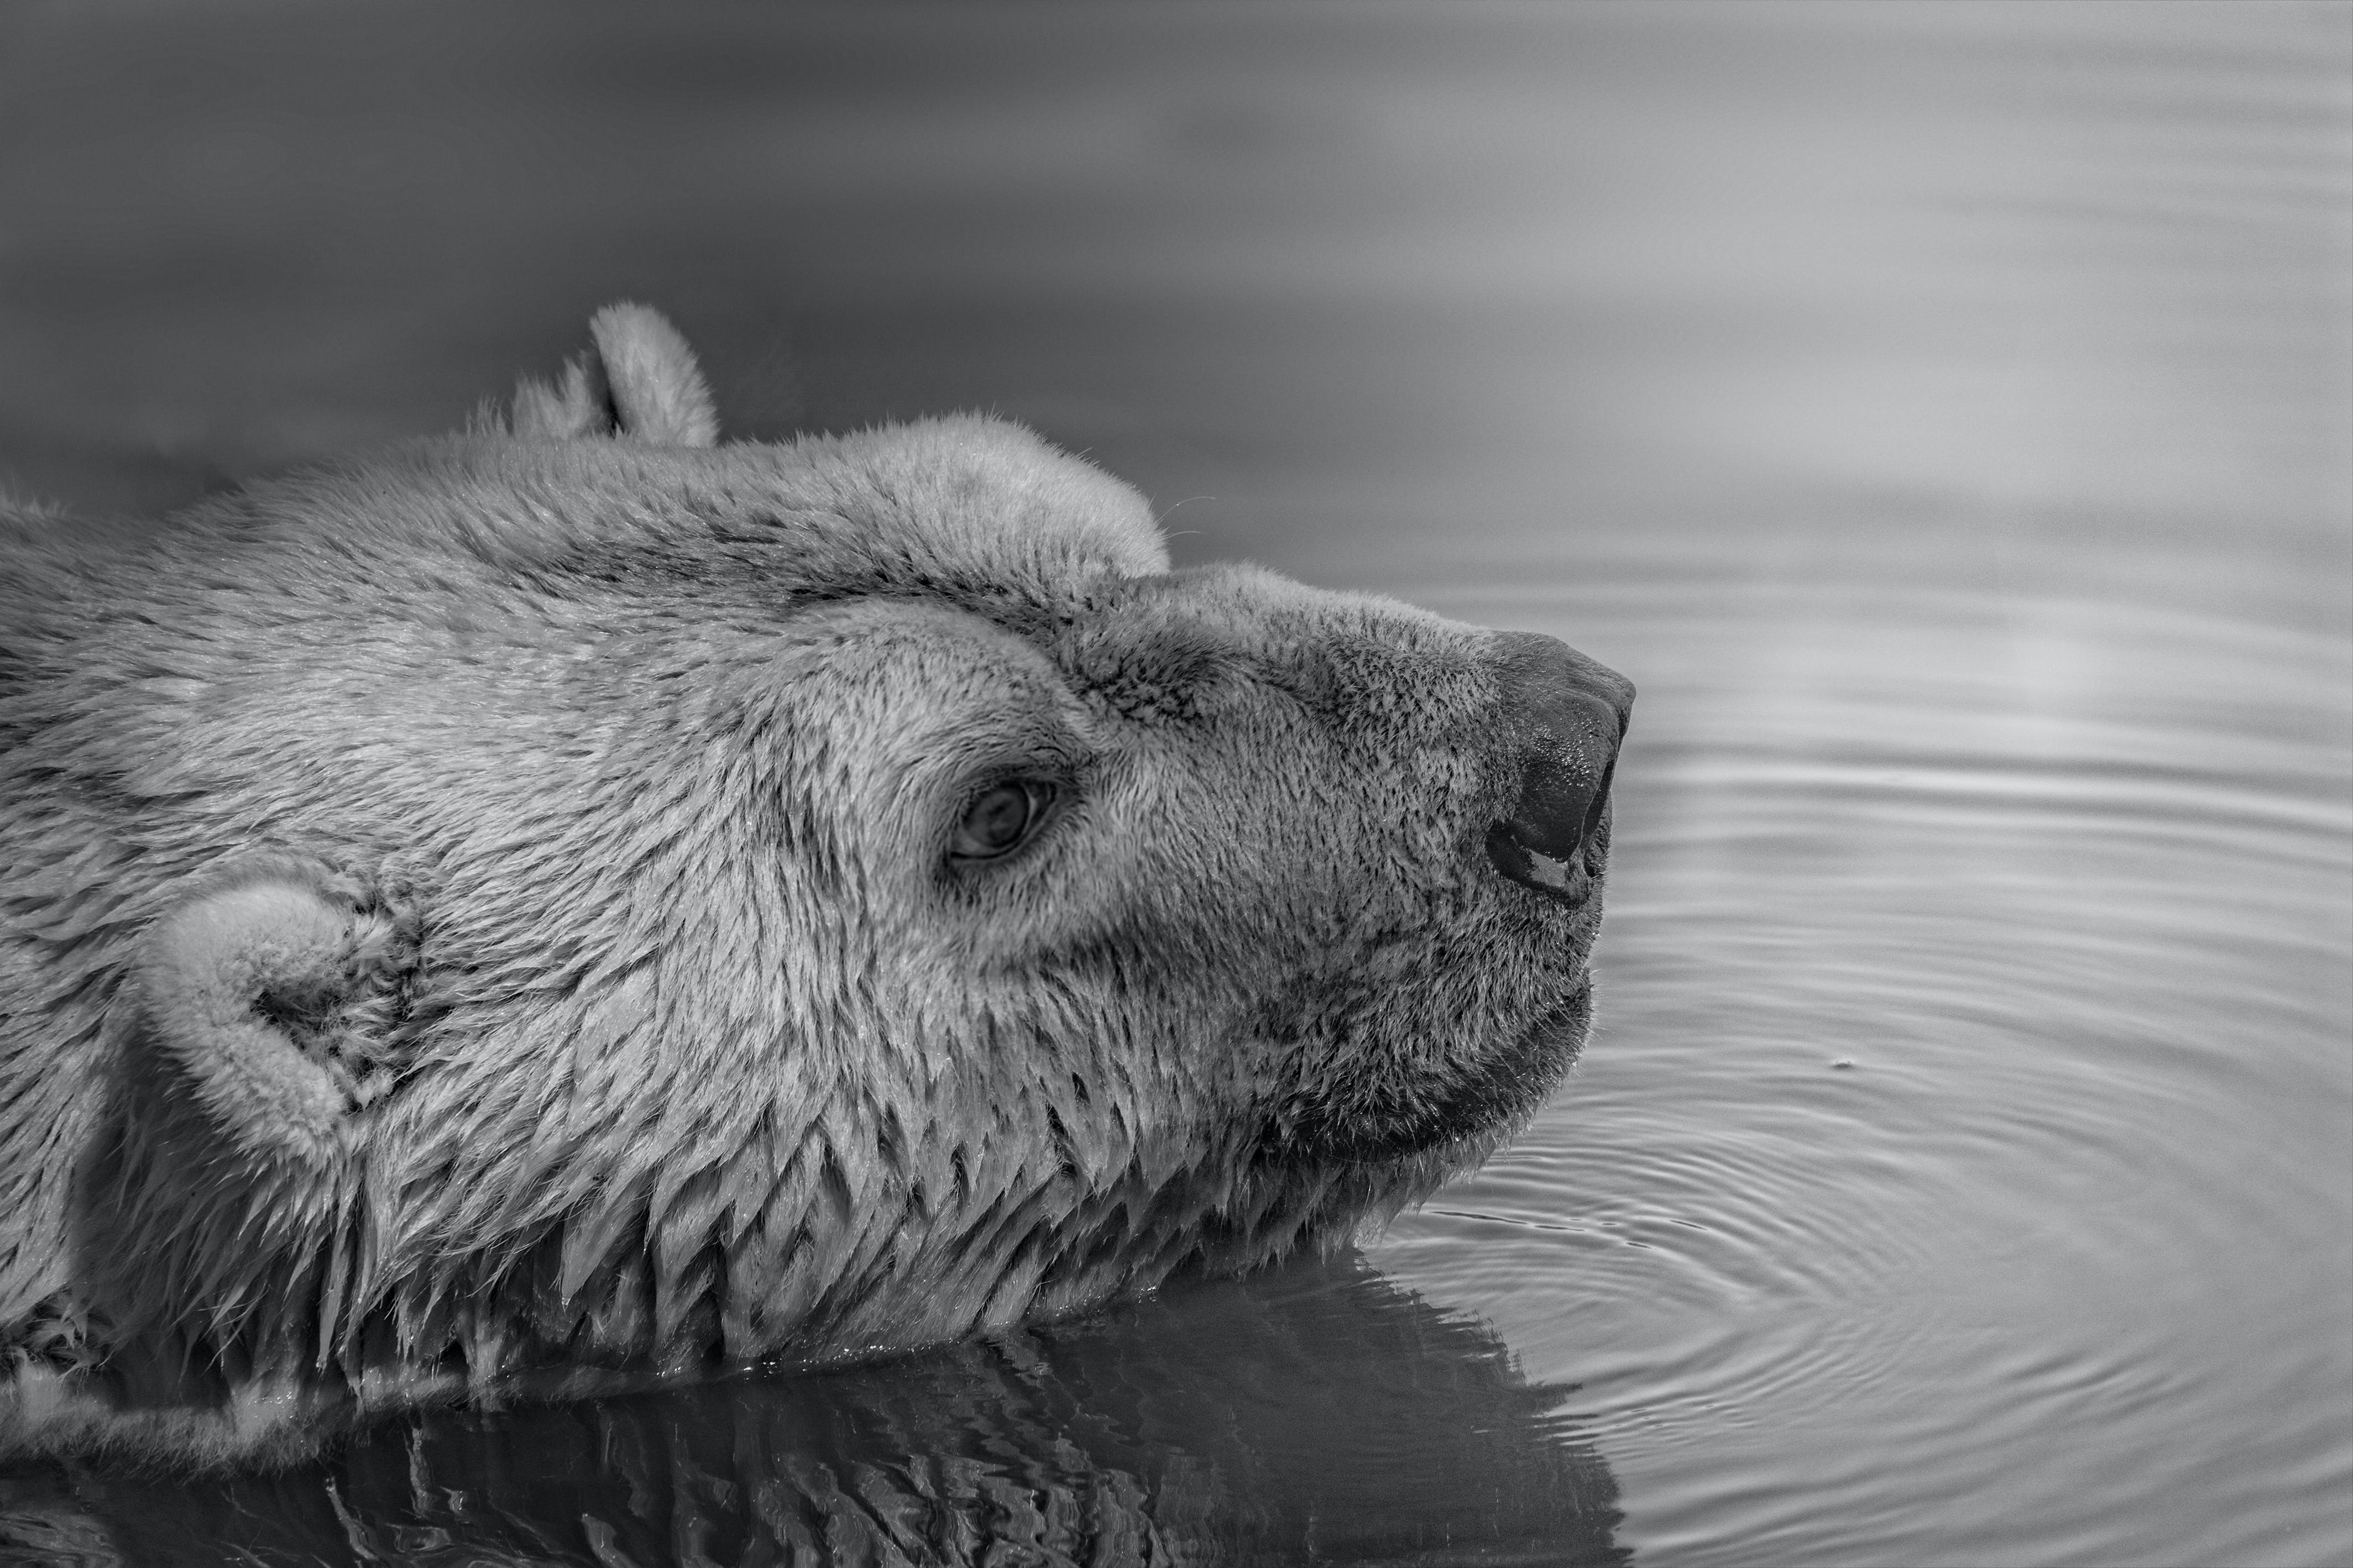 Bear on Water